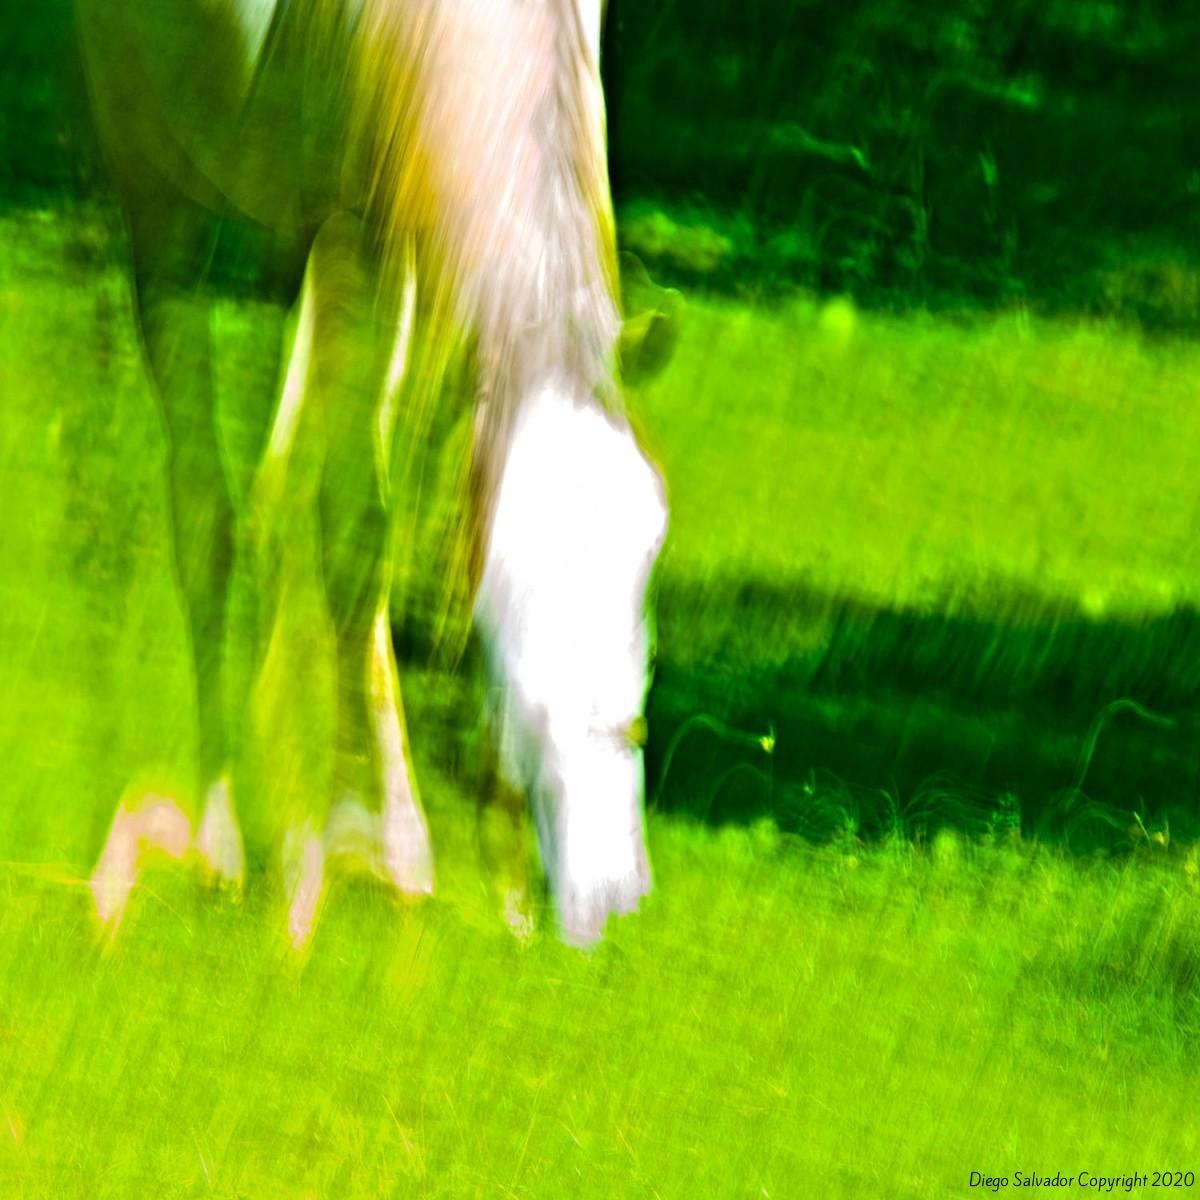 2014 - Eleganthorse3 - Diego Salvador